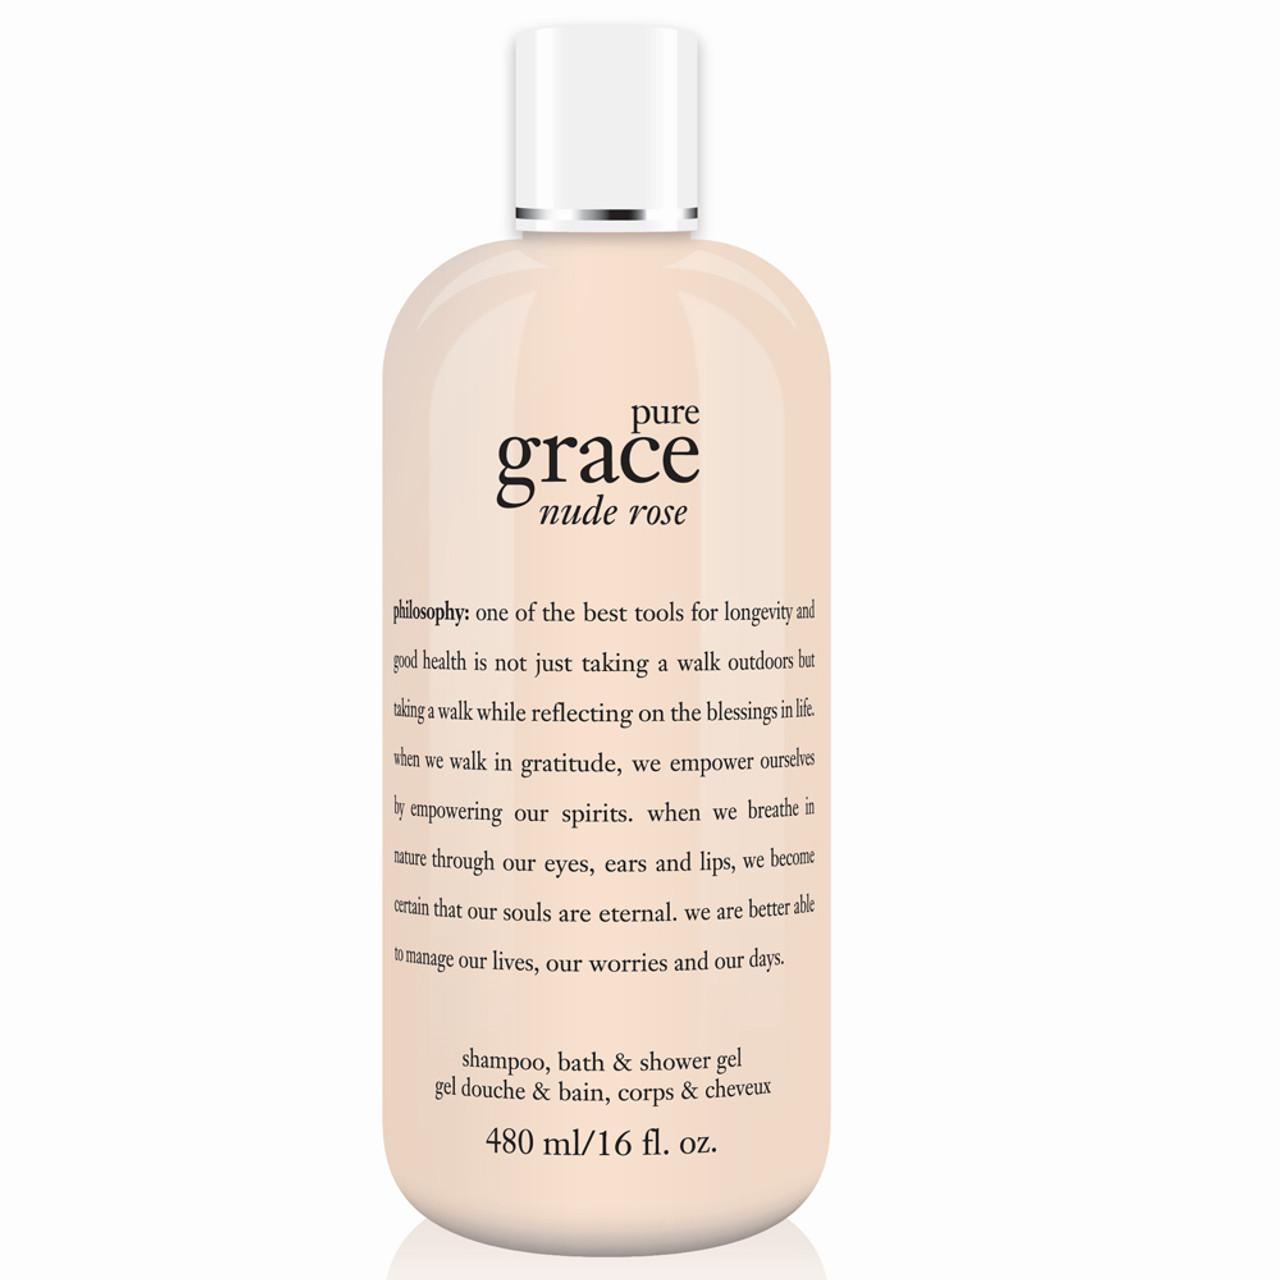 philosophy Pure Grace Nude Rose Shower Gel